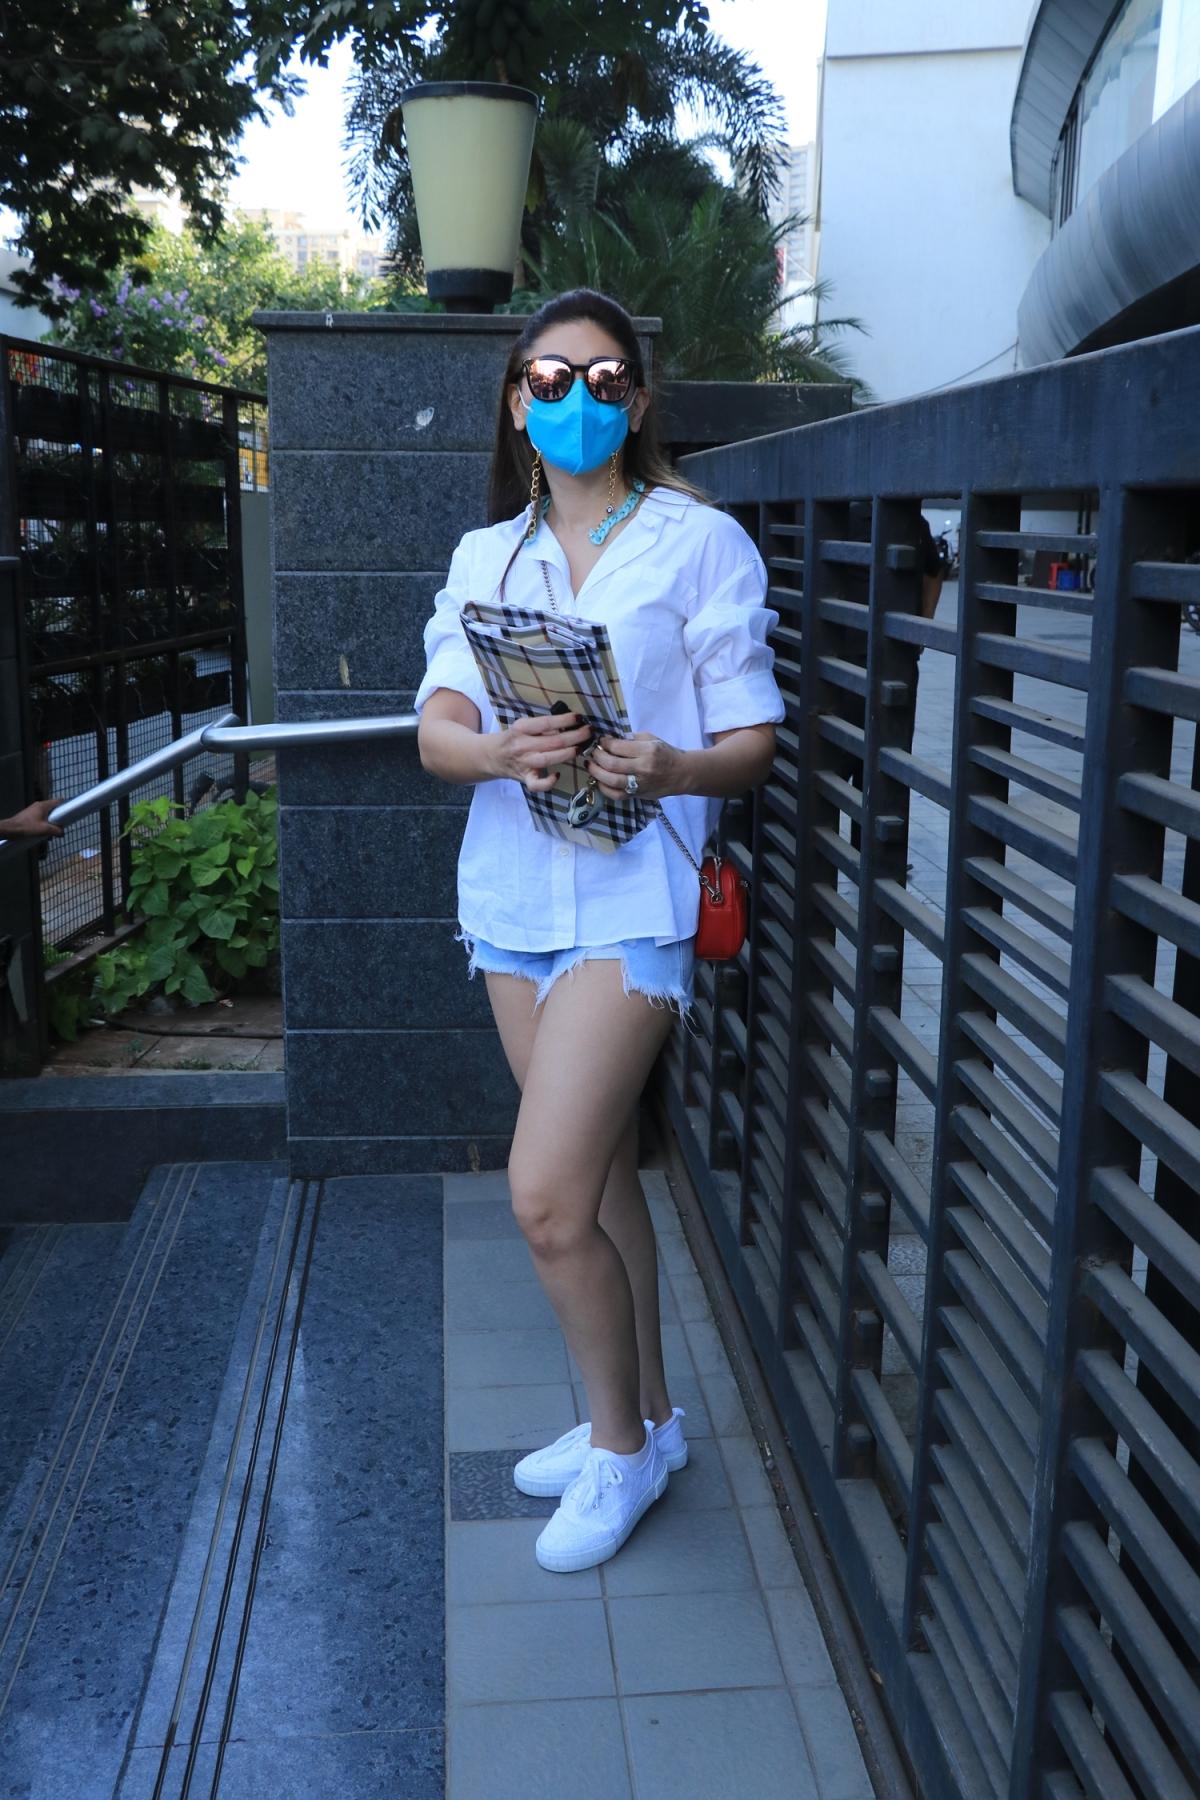 'Corona jayega chaddi me': Shefali Jariwala trolled for stepping out to buy essentials wearing 'hot shorts'